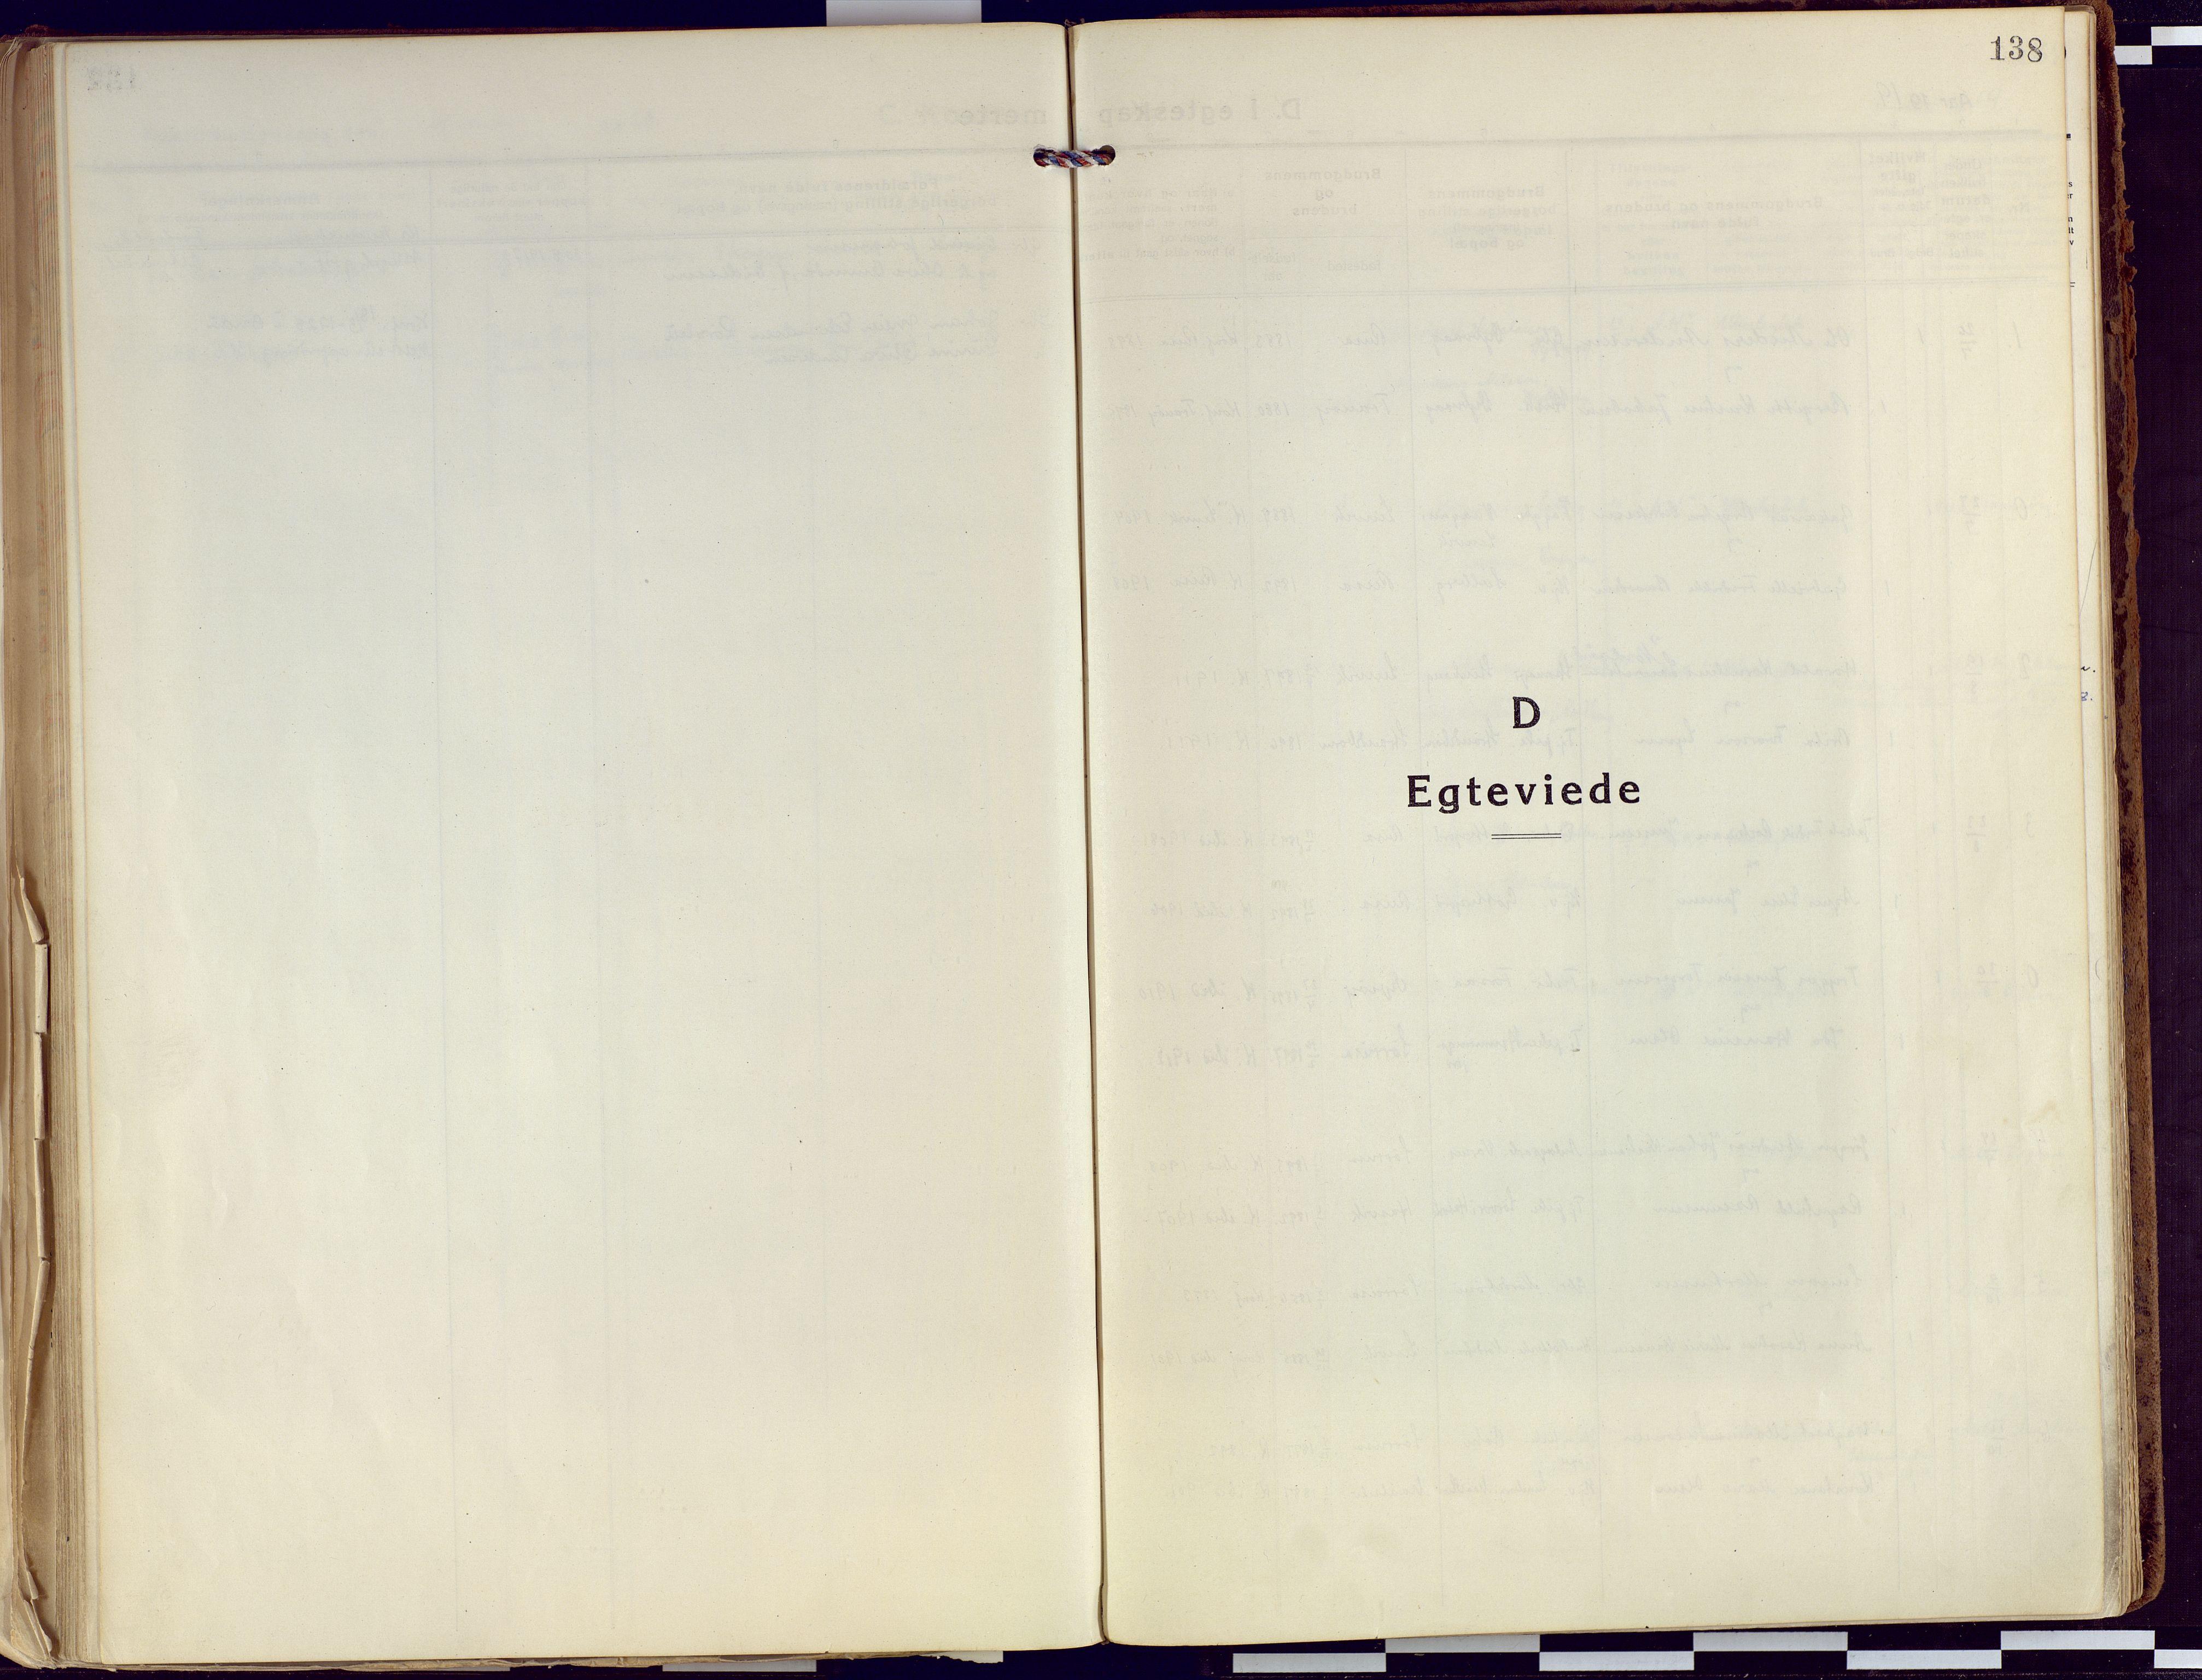 SATØ, Tranøy sokneprestkontor, I/Ia/Iaa/L0015kirke: Ministerialbok nr. 15, 1919-1928, s. 138